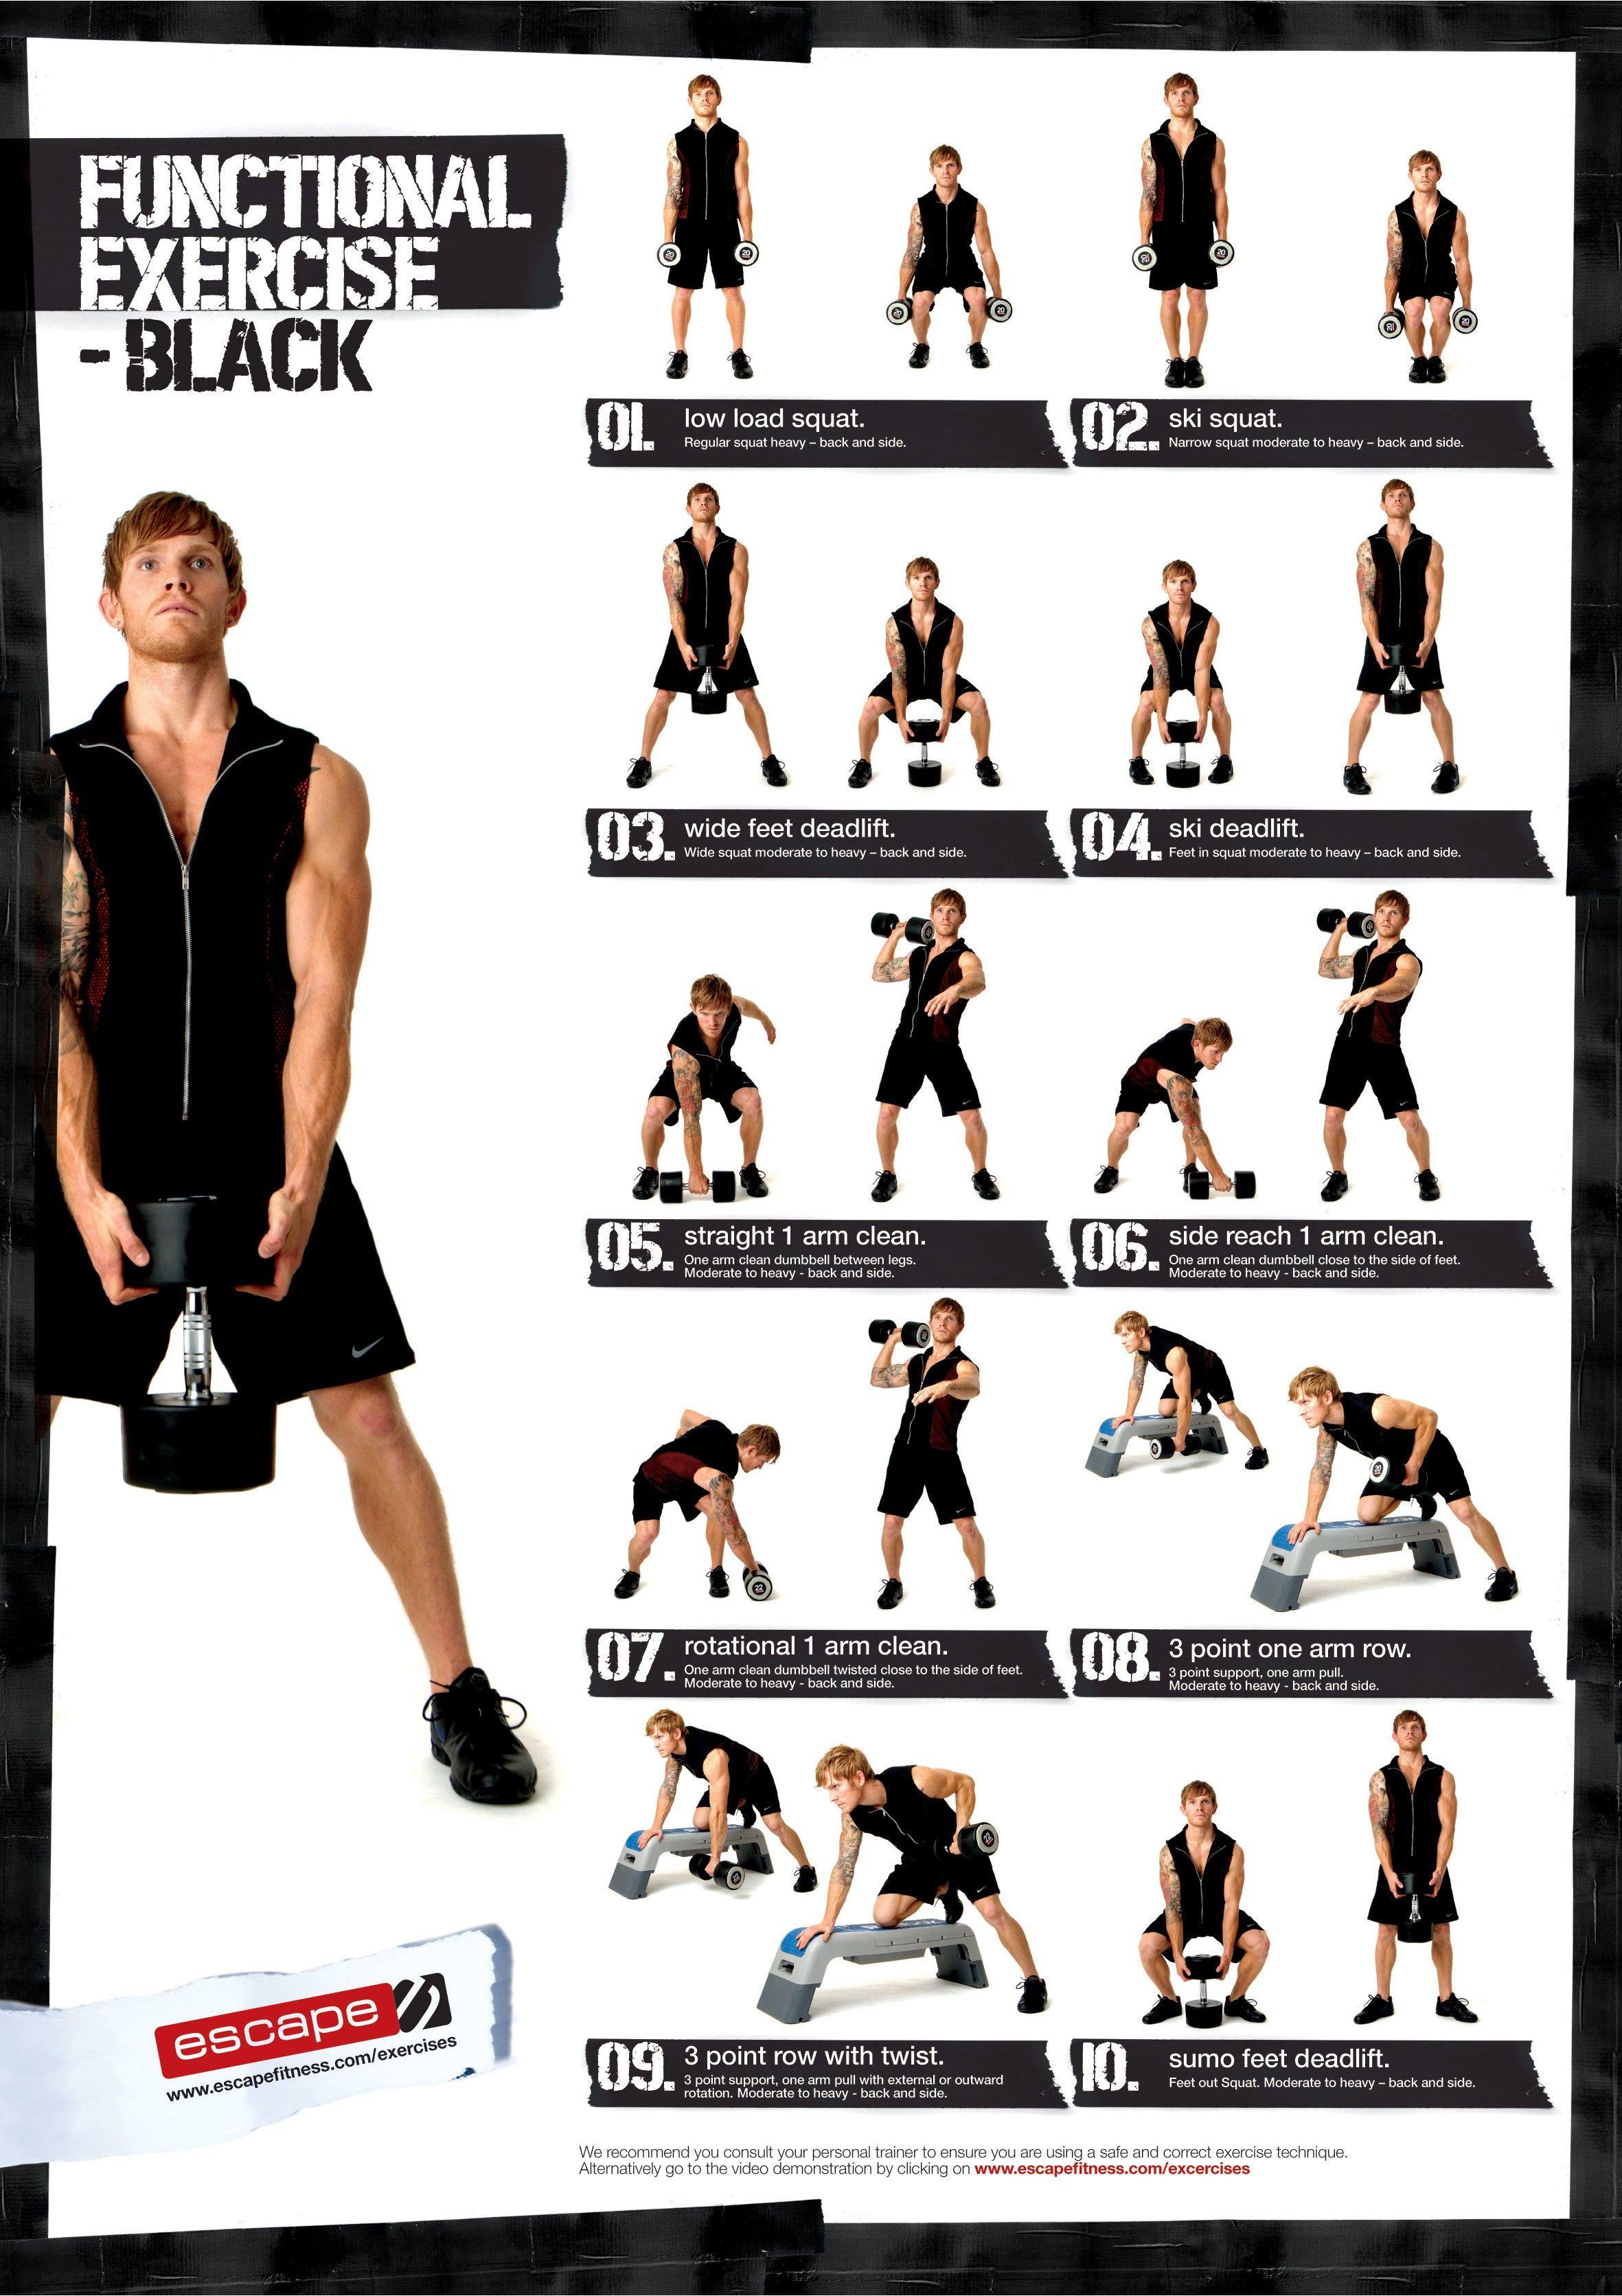 Functional exercise - black | Workout | Pinterest